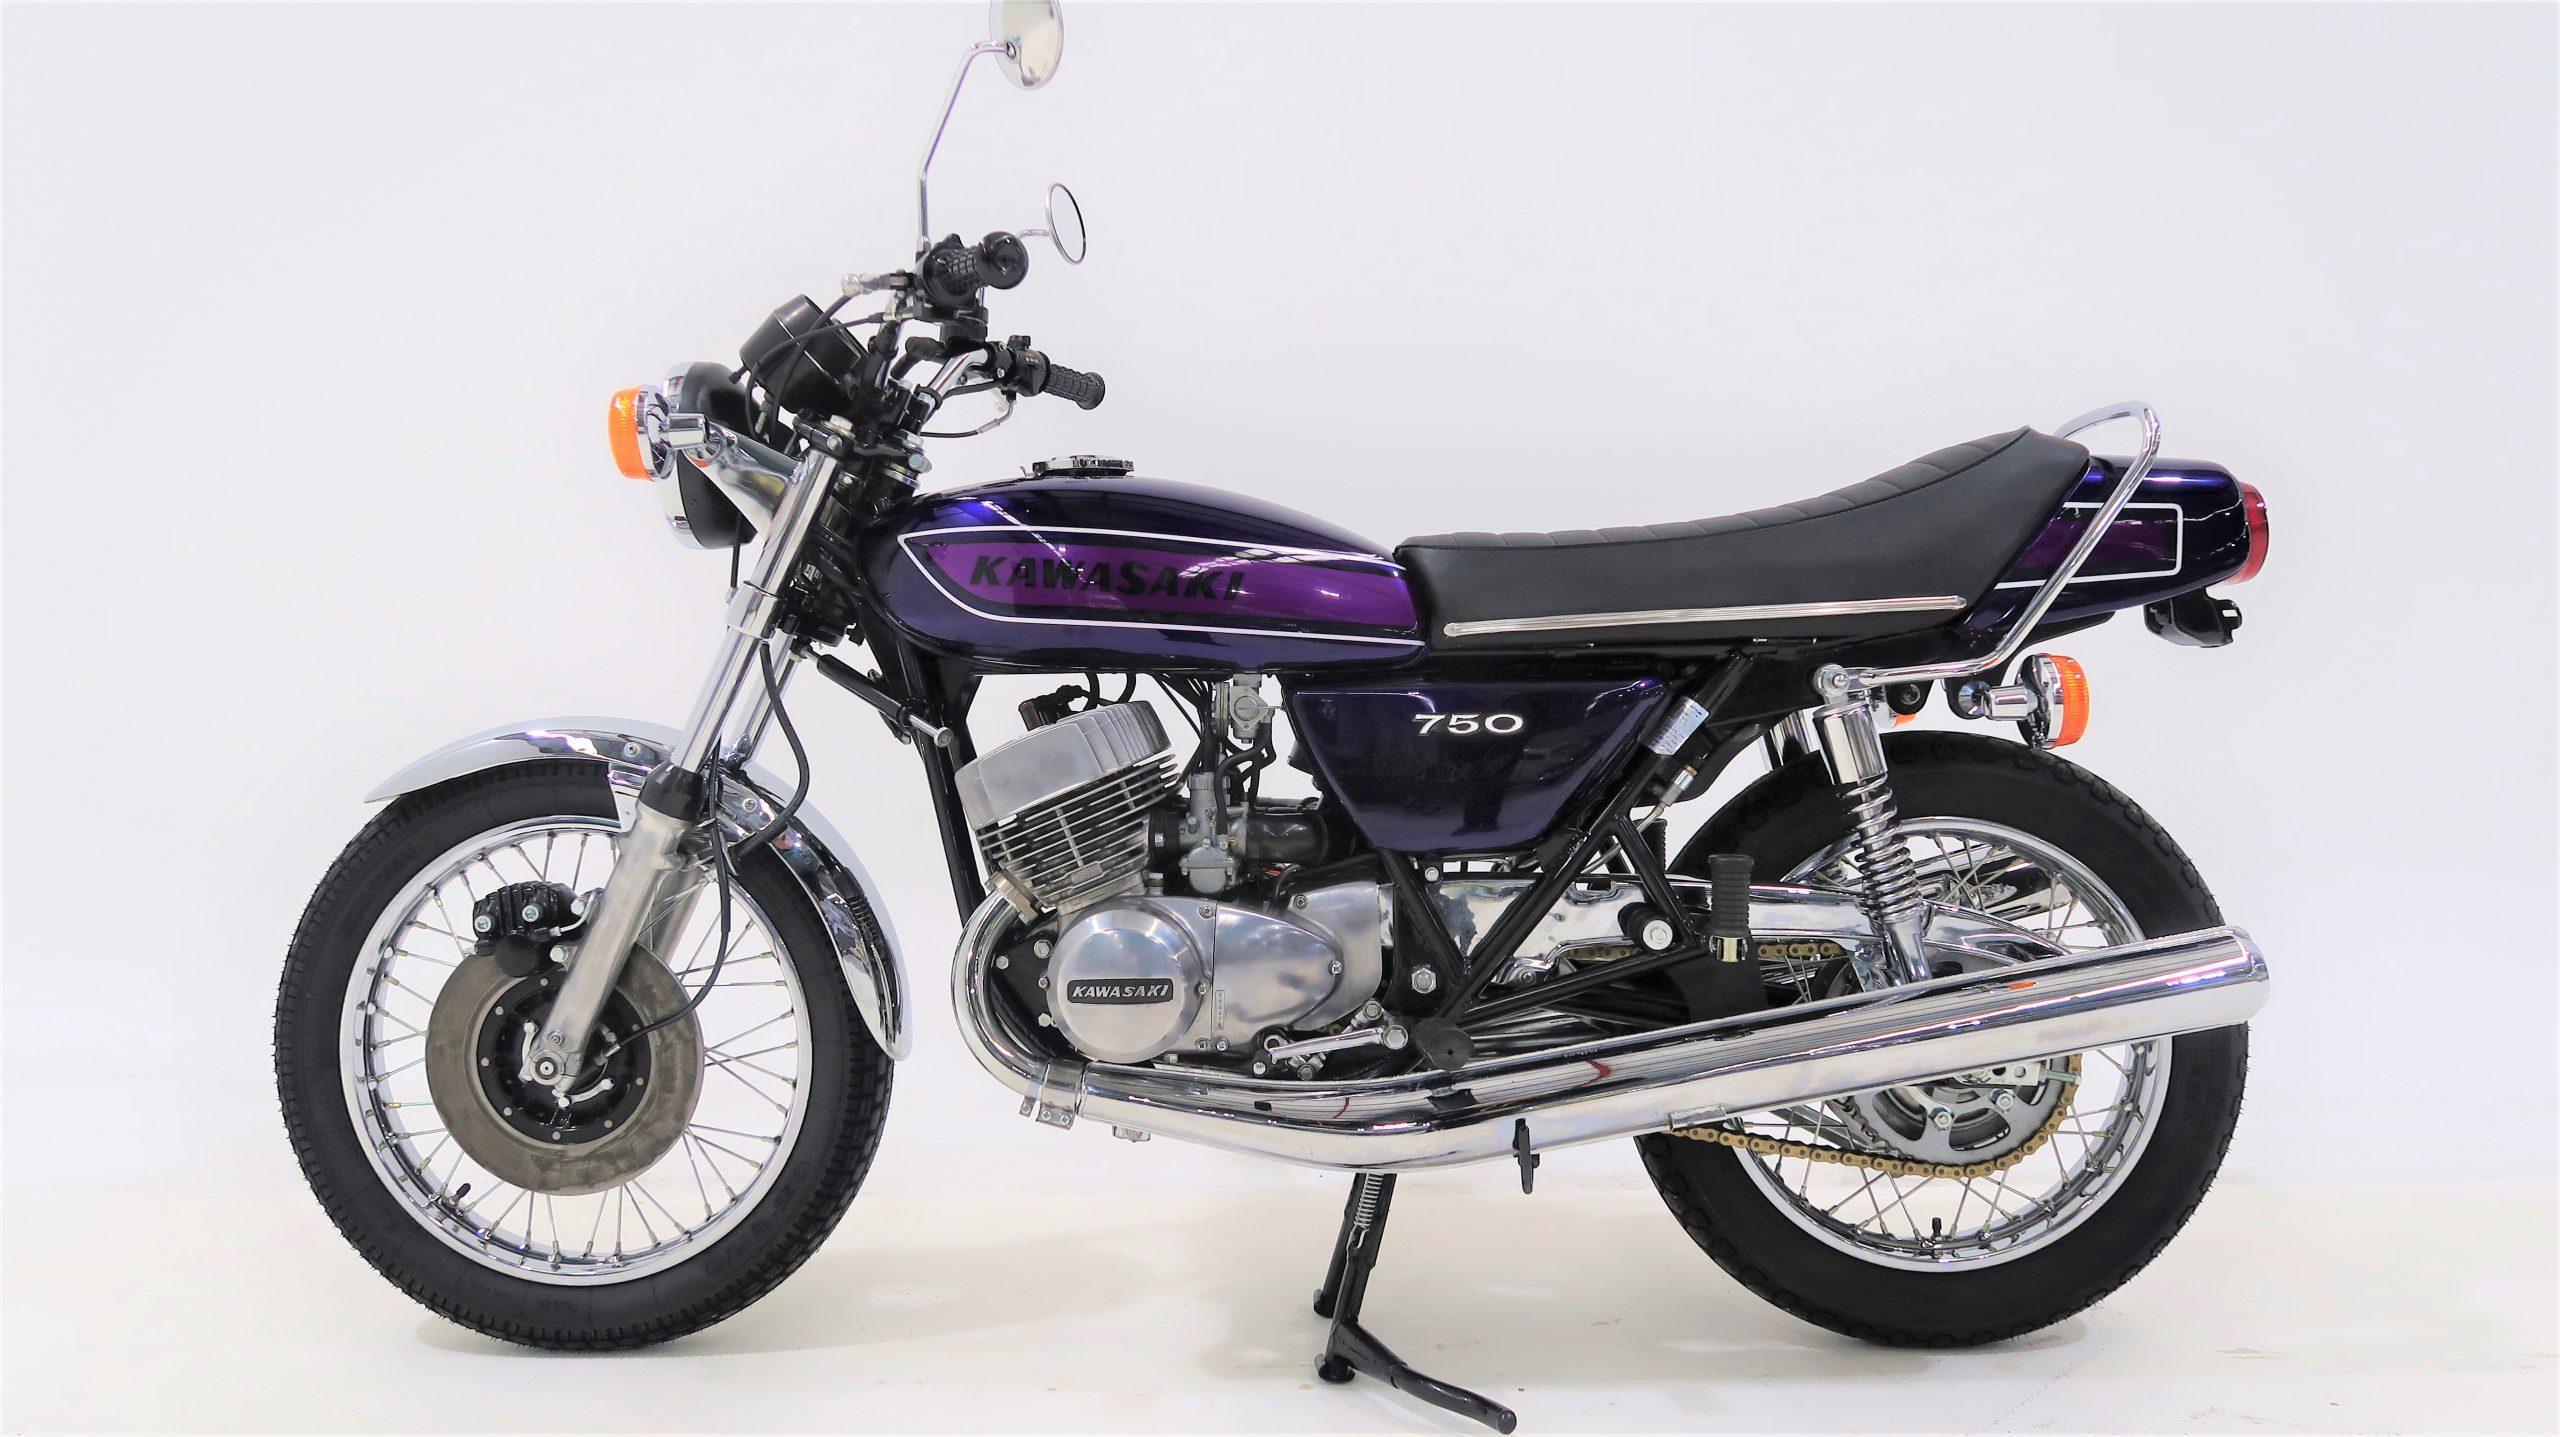 Kawasaki H2C 750cc 2-stroke triple